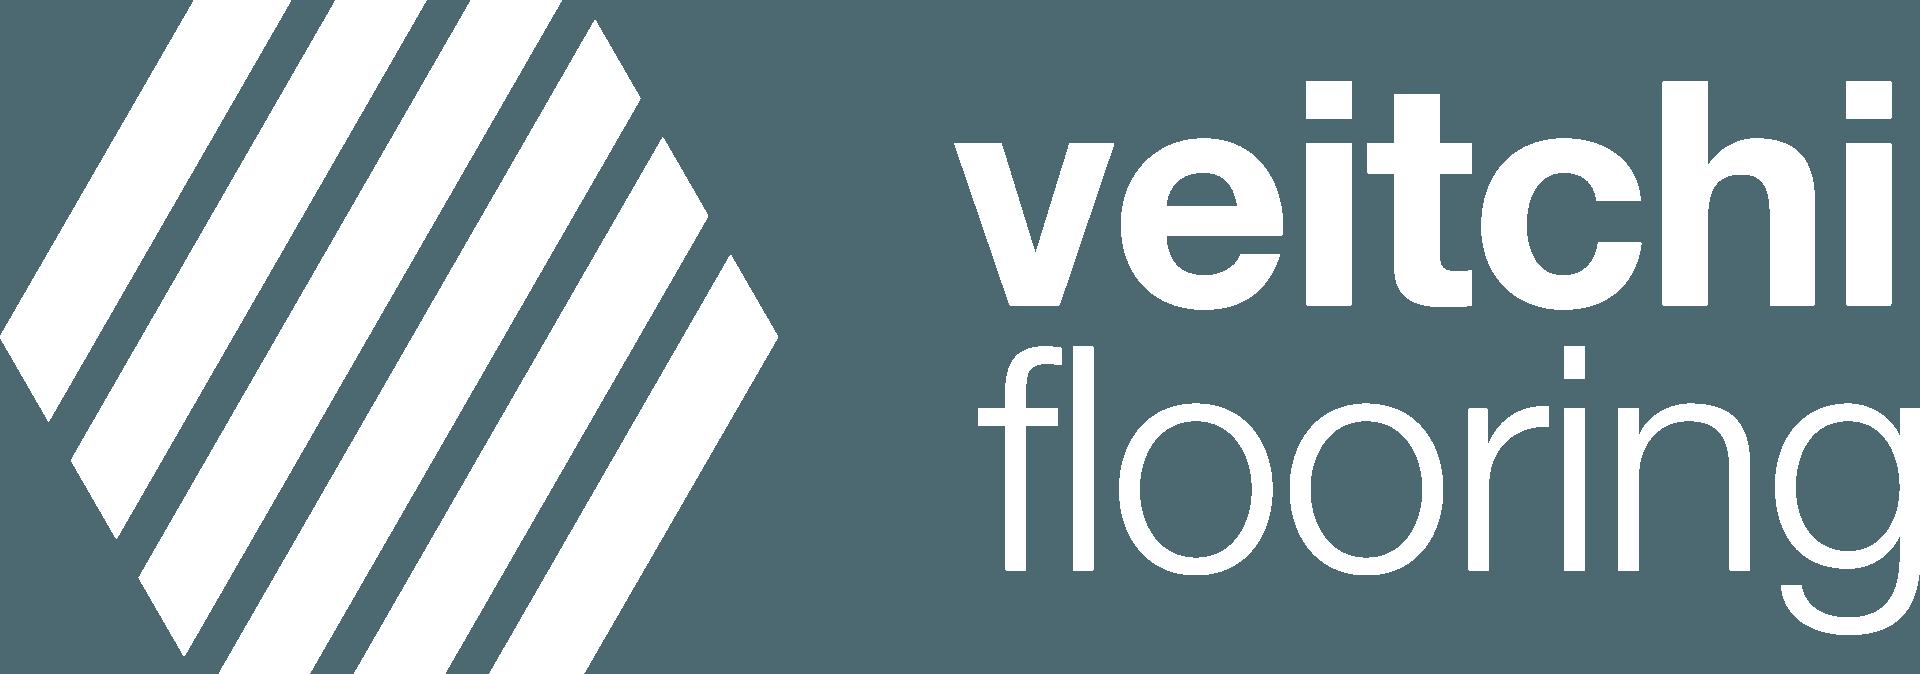 Veitchi Flooring logo